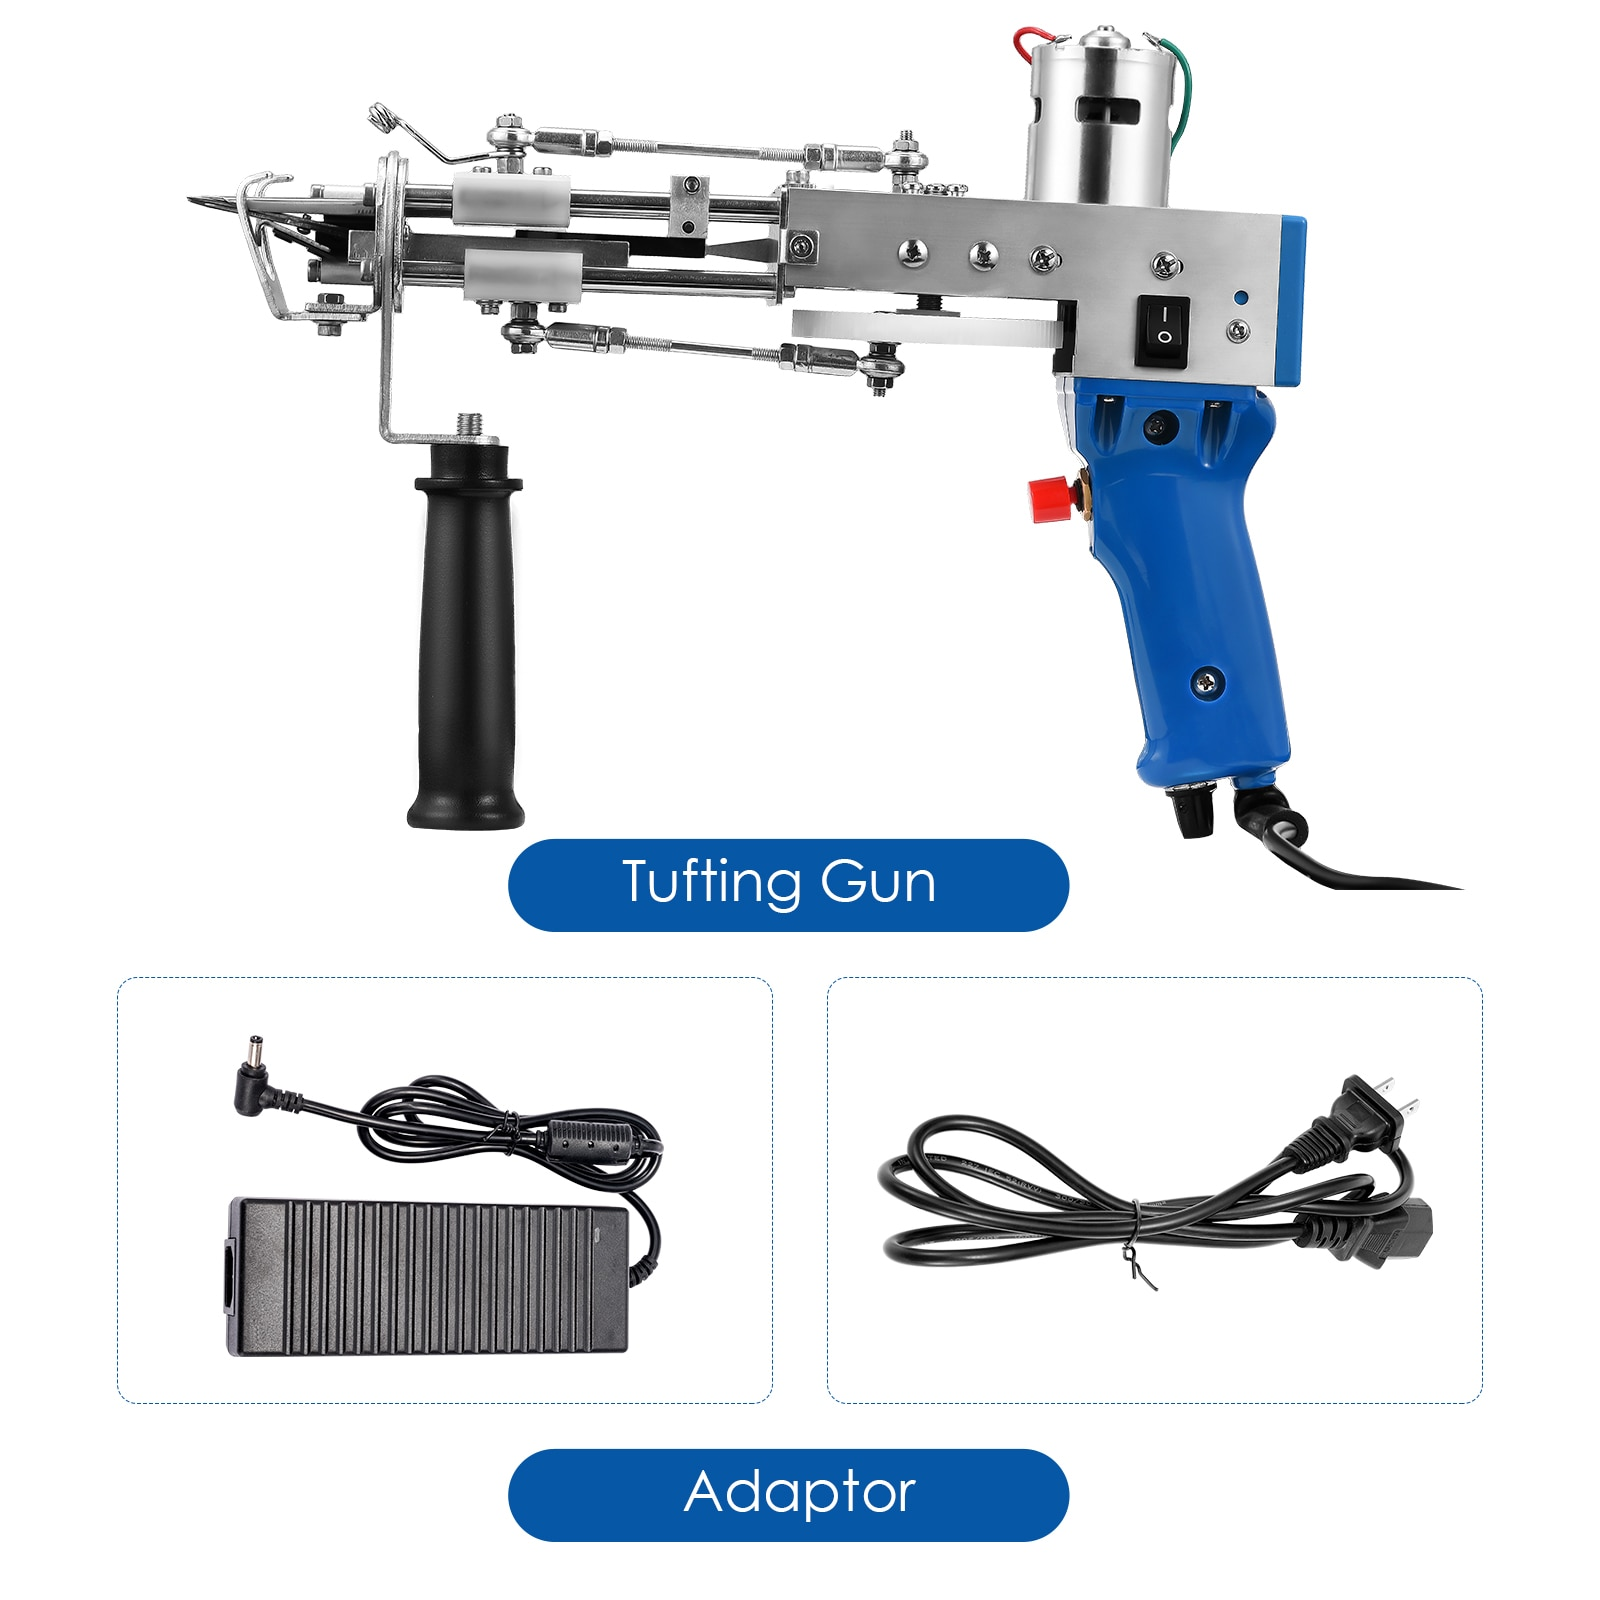 Upgrade 2 In 1 Tufting Gun Both Cut Pile And Loop Pile Electric Carpet Tufting Gun Hand Gun Carpet Weaving Flocking Machines enlarge